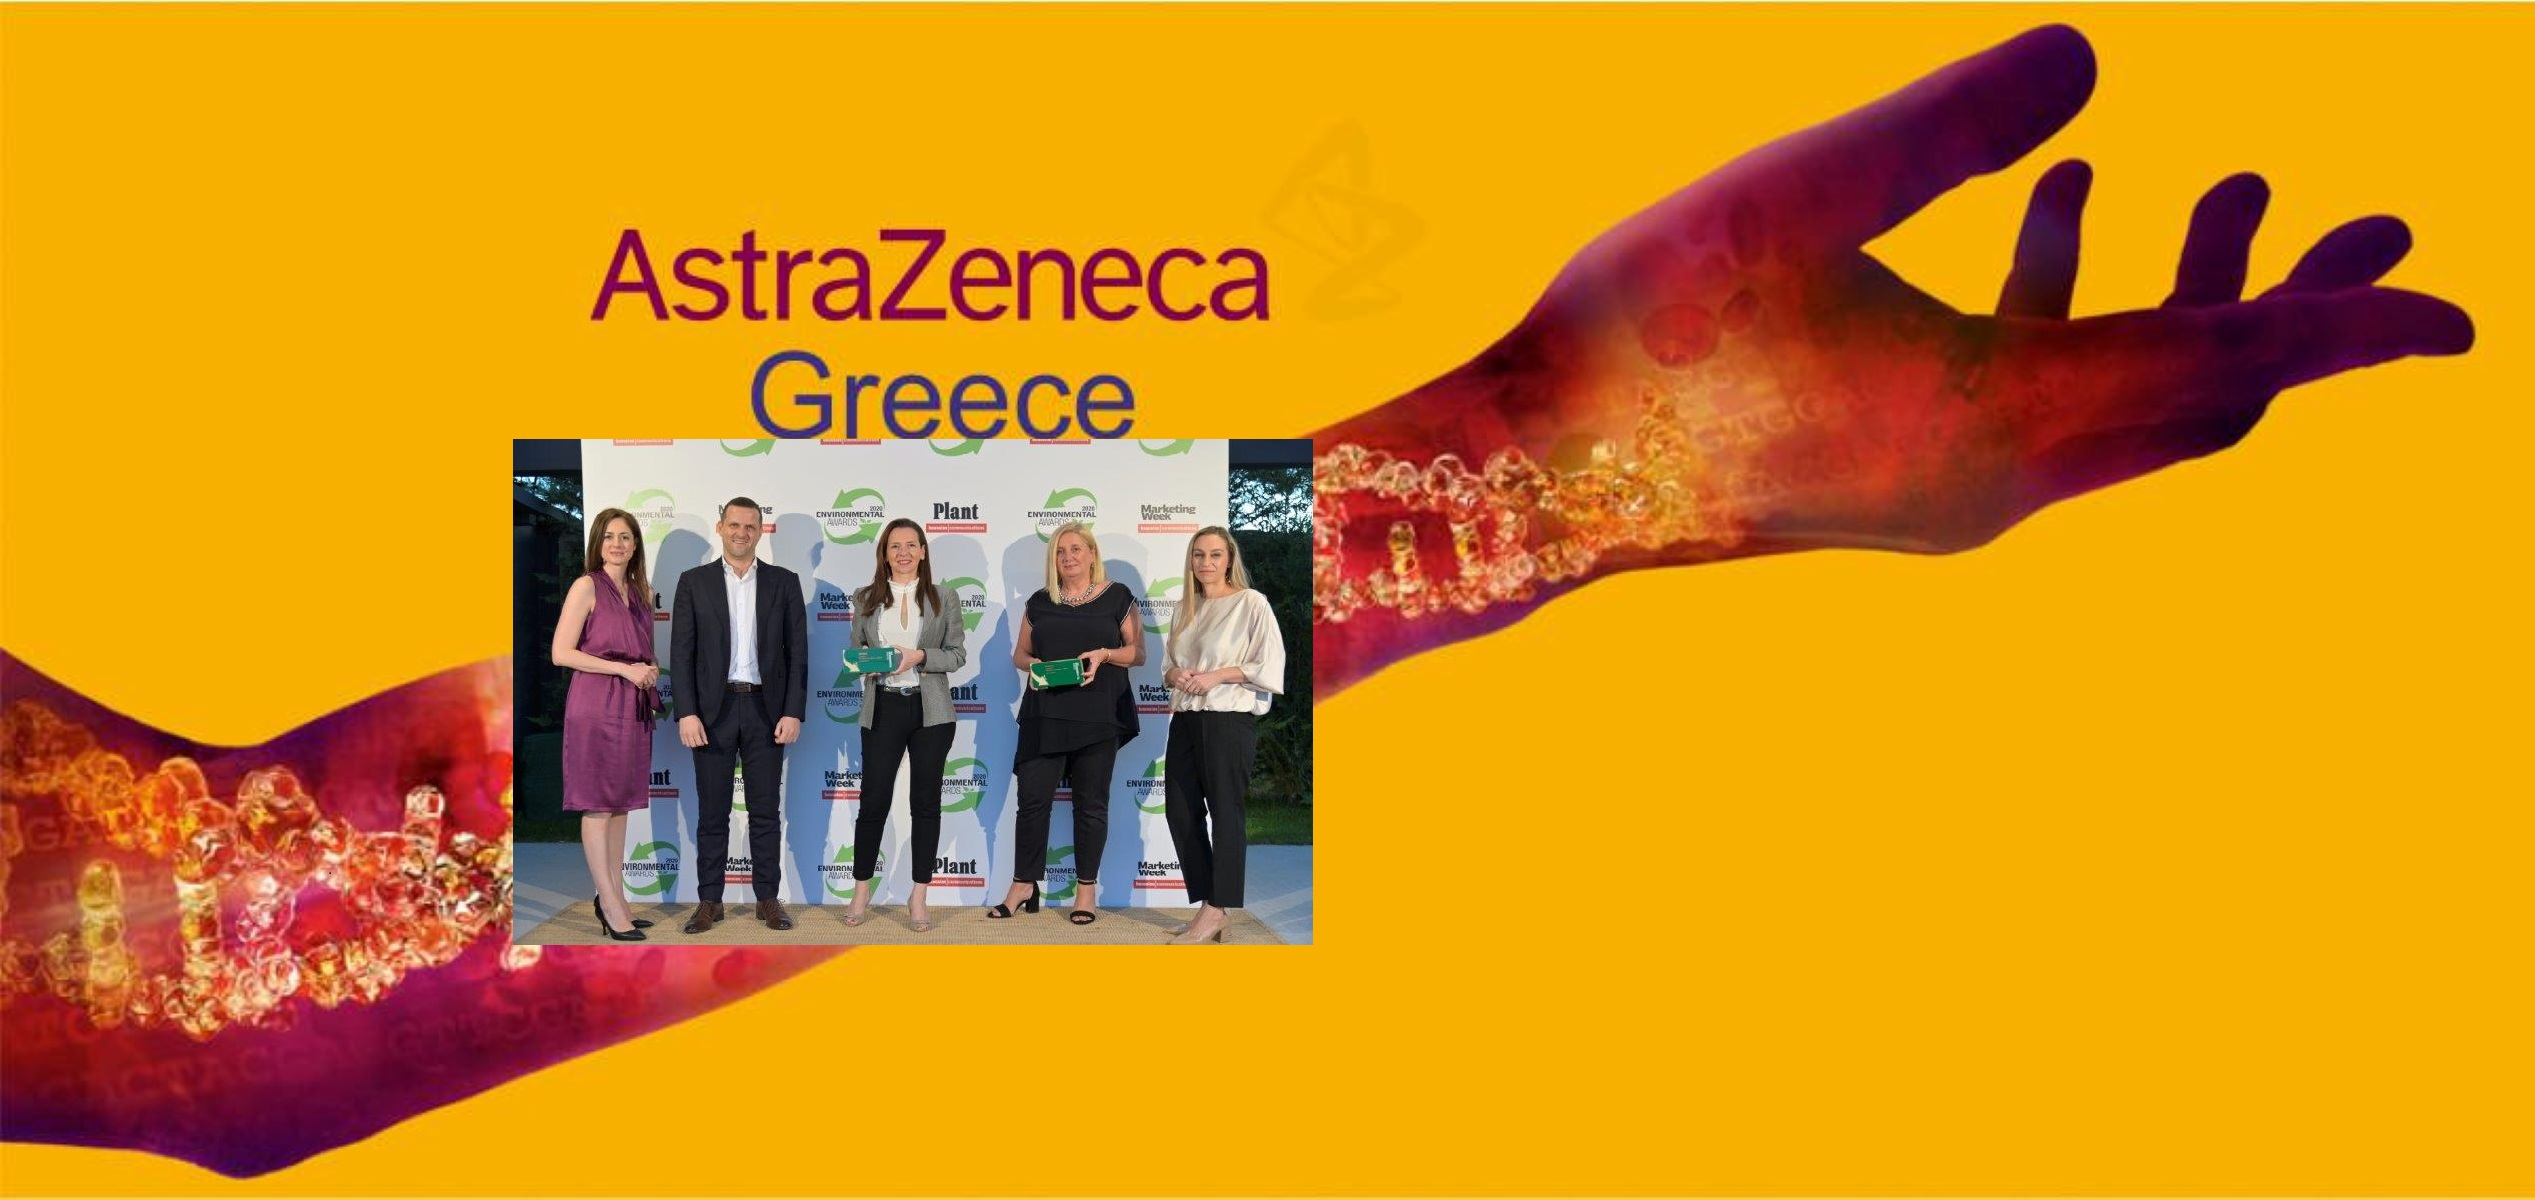 AstraZeneca διάκριση: Έλαβε Bronze βραβείο για το πρόγραμμα «Προστατεύουμε το περιβάλλον… με πράξεις!»